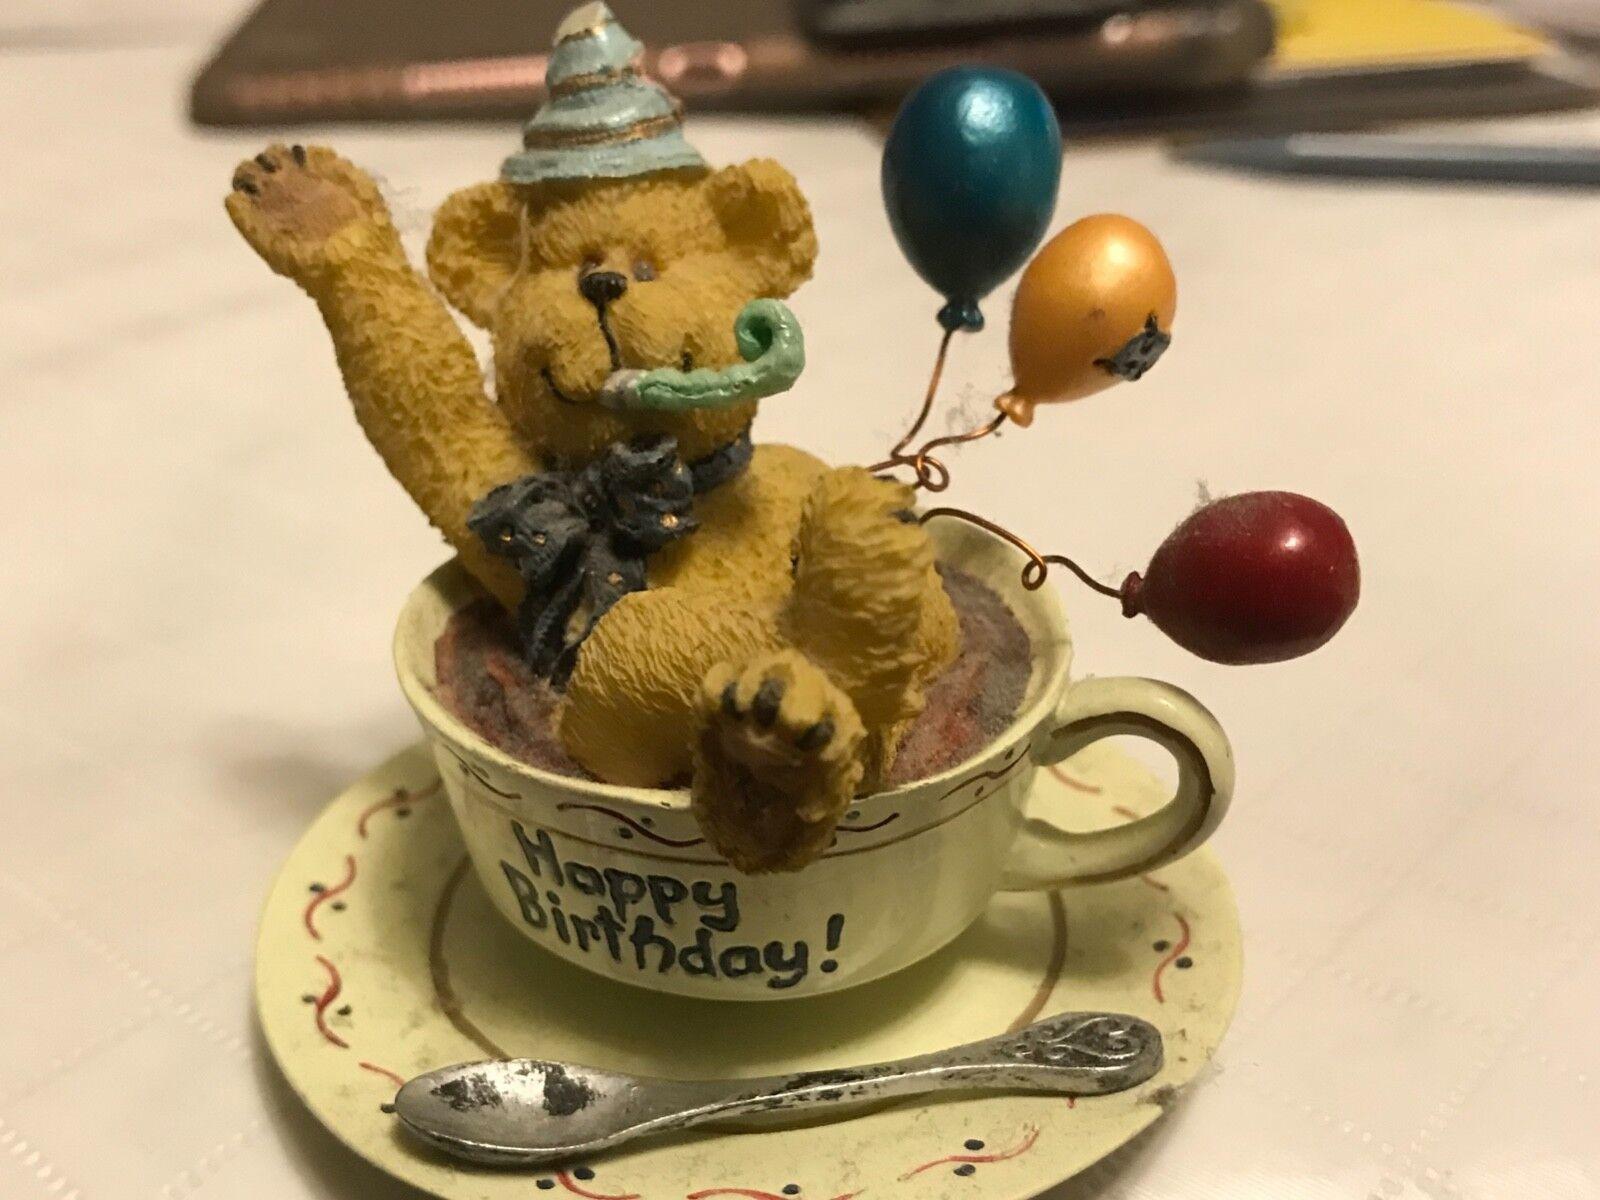 NWT NWT NWT H.B. Teabearie 2003 Happy Birthday  24320 26e0a7